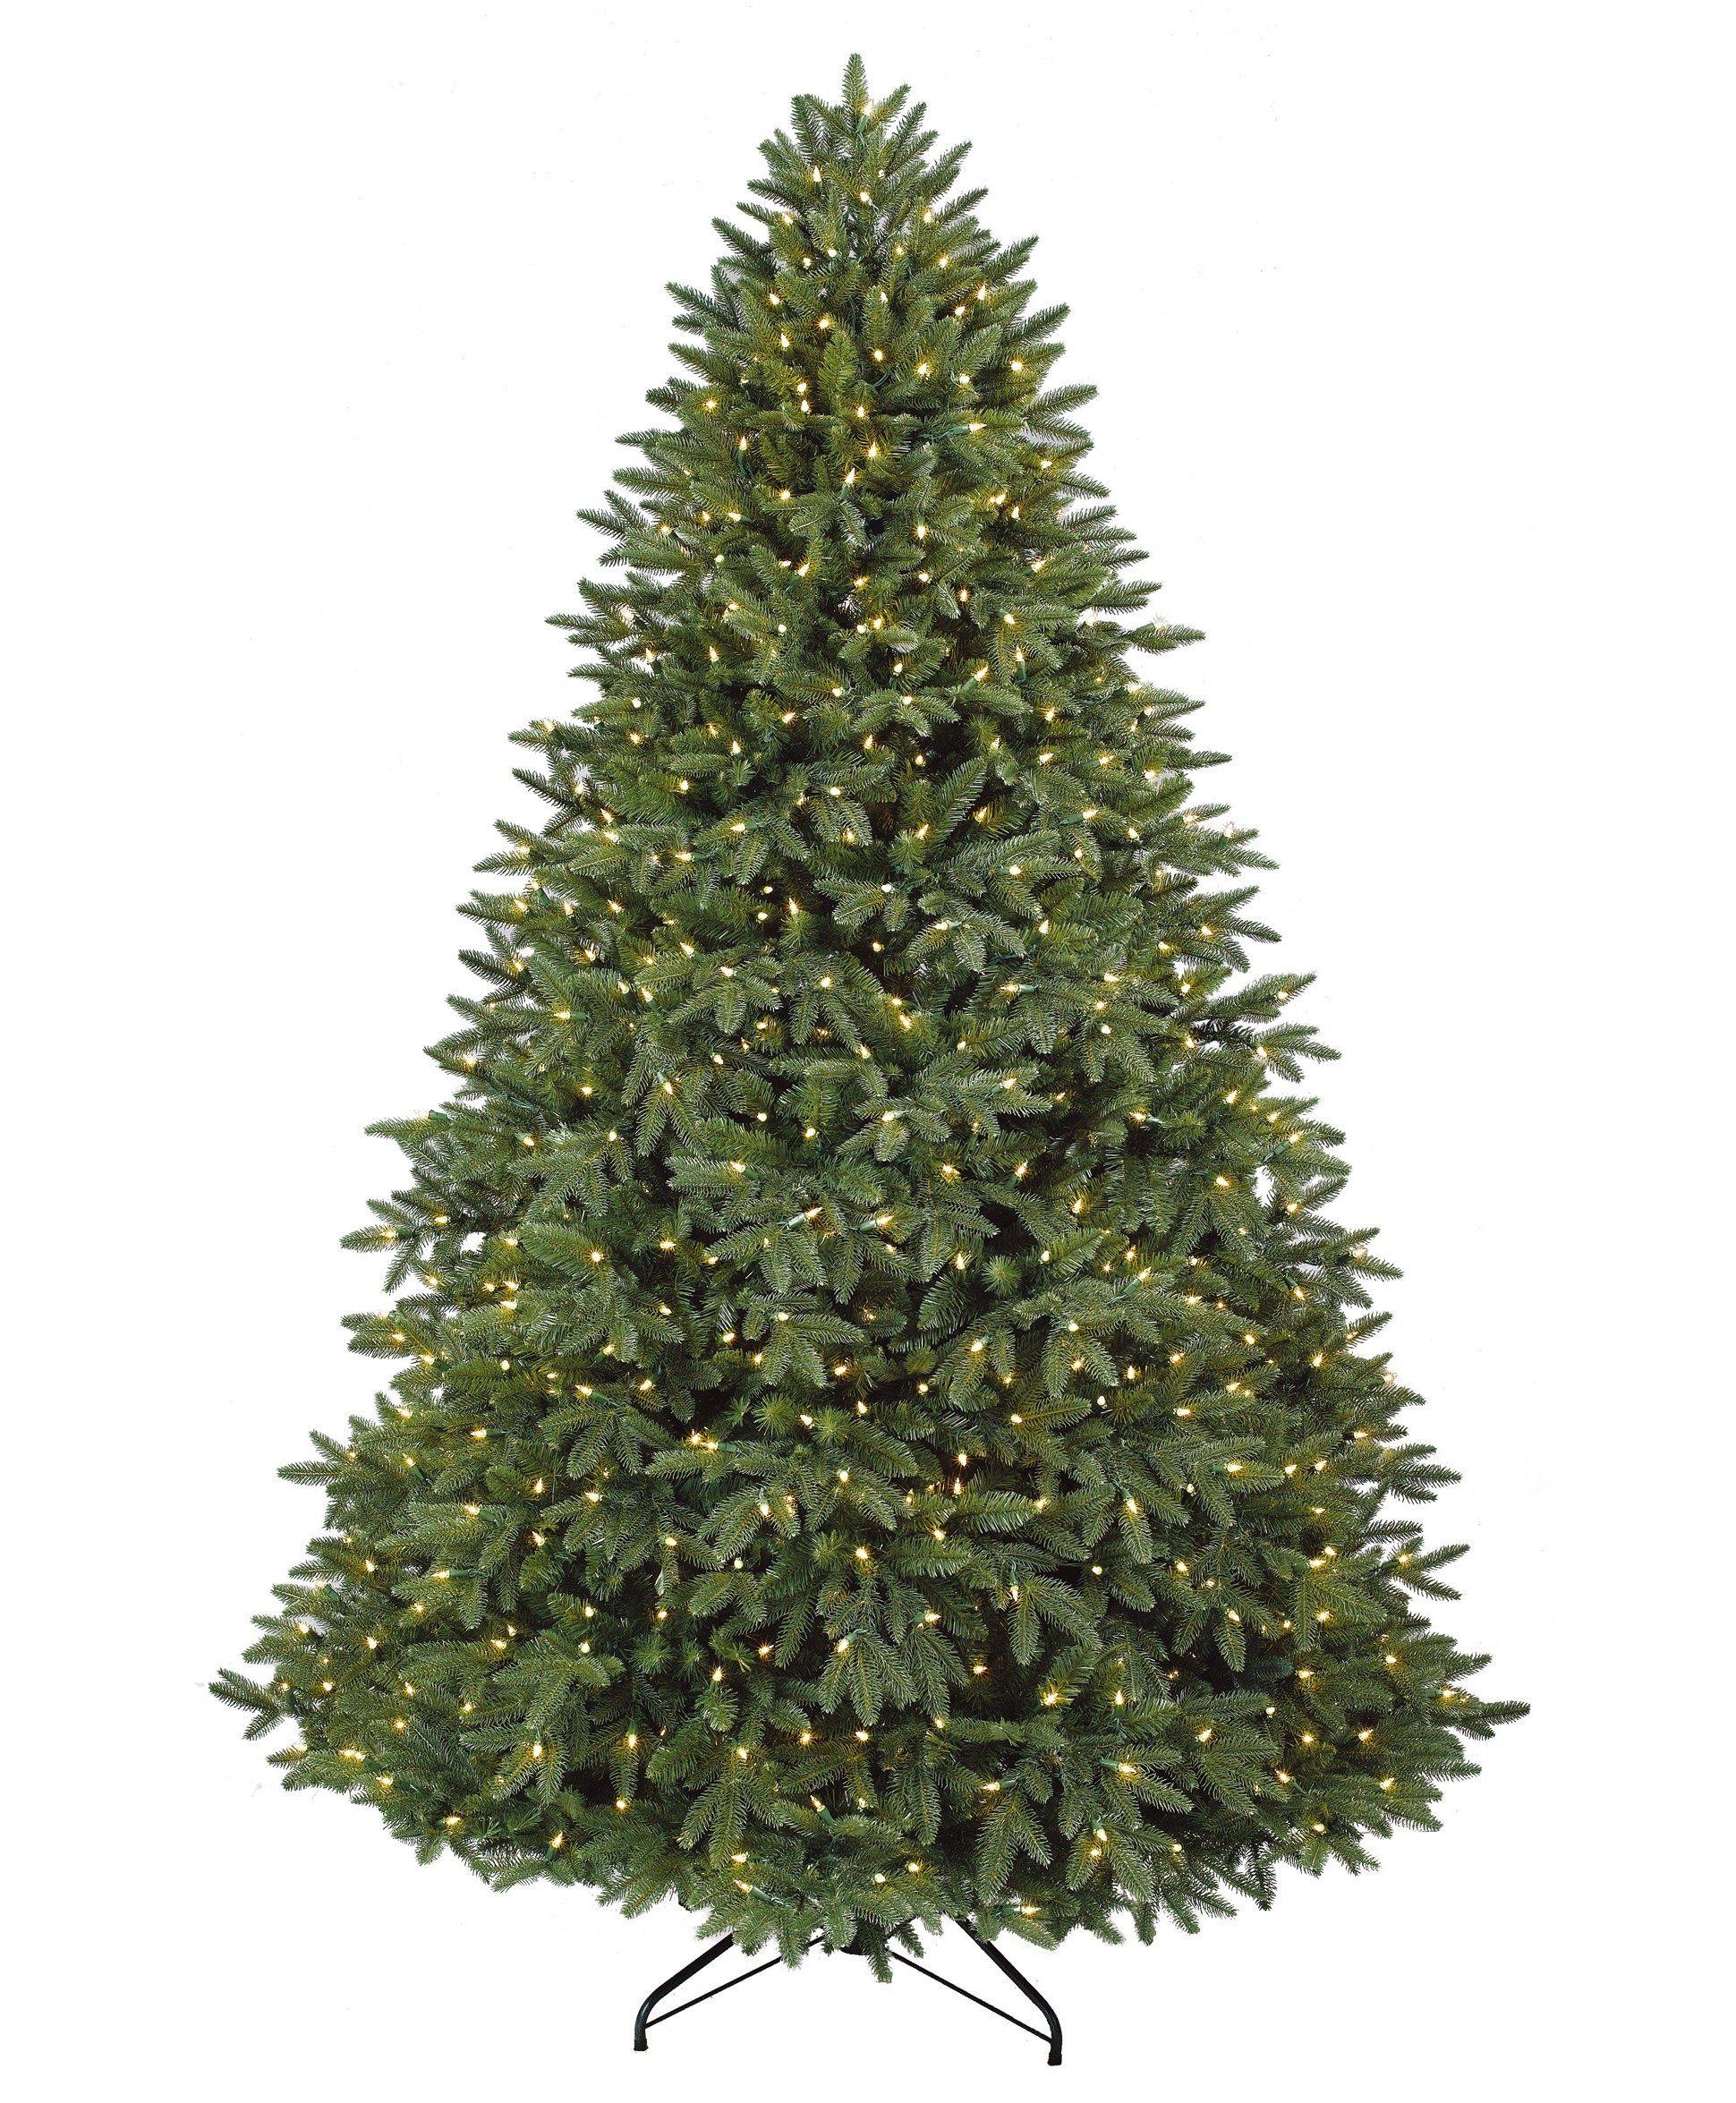 Monticello Regency Fir Artificial Christmas Tree #Treeclassicschristmas